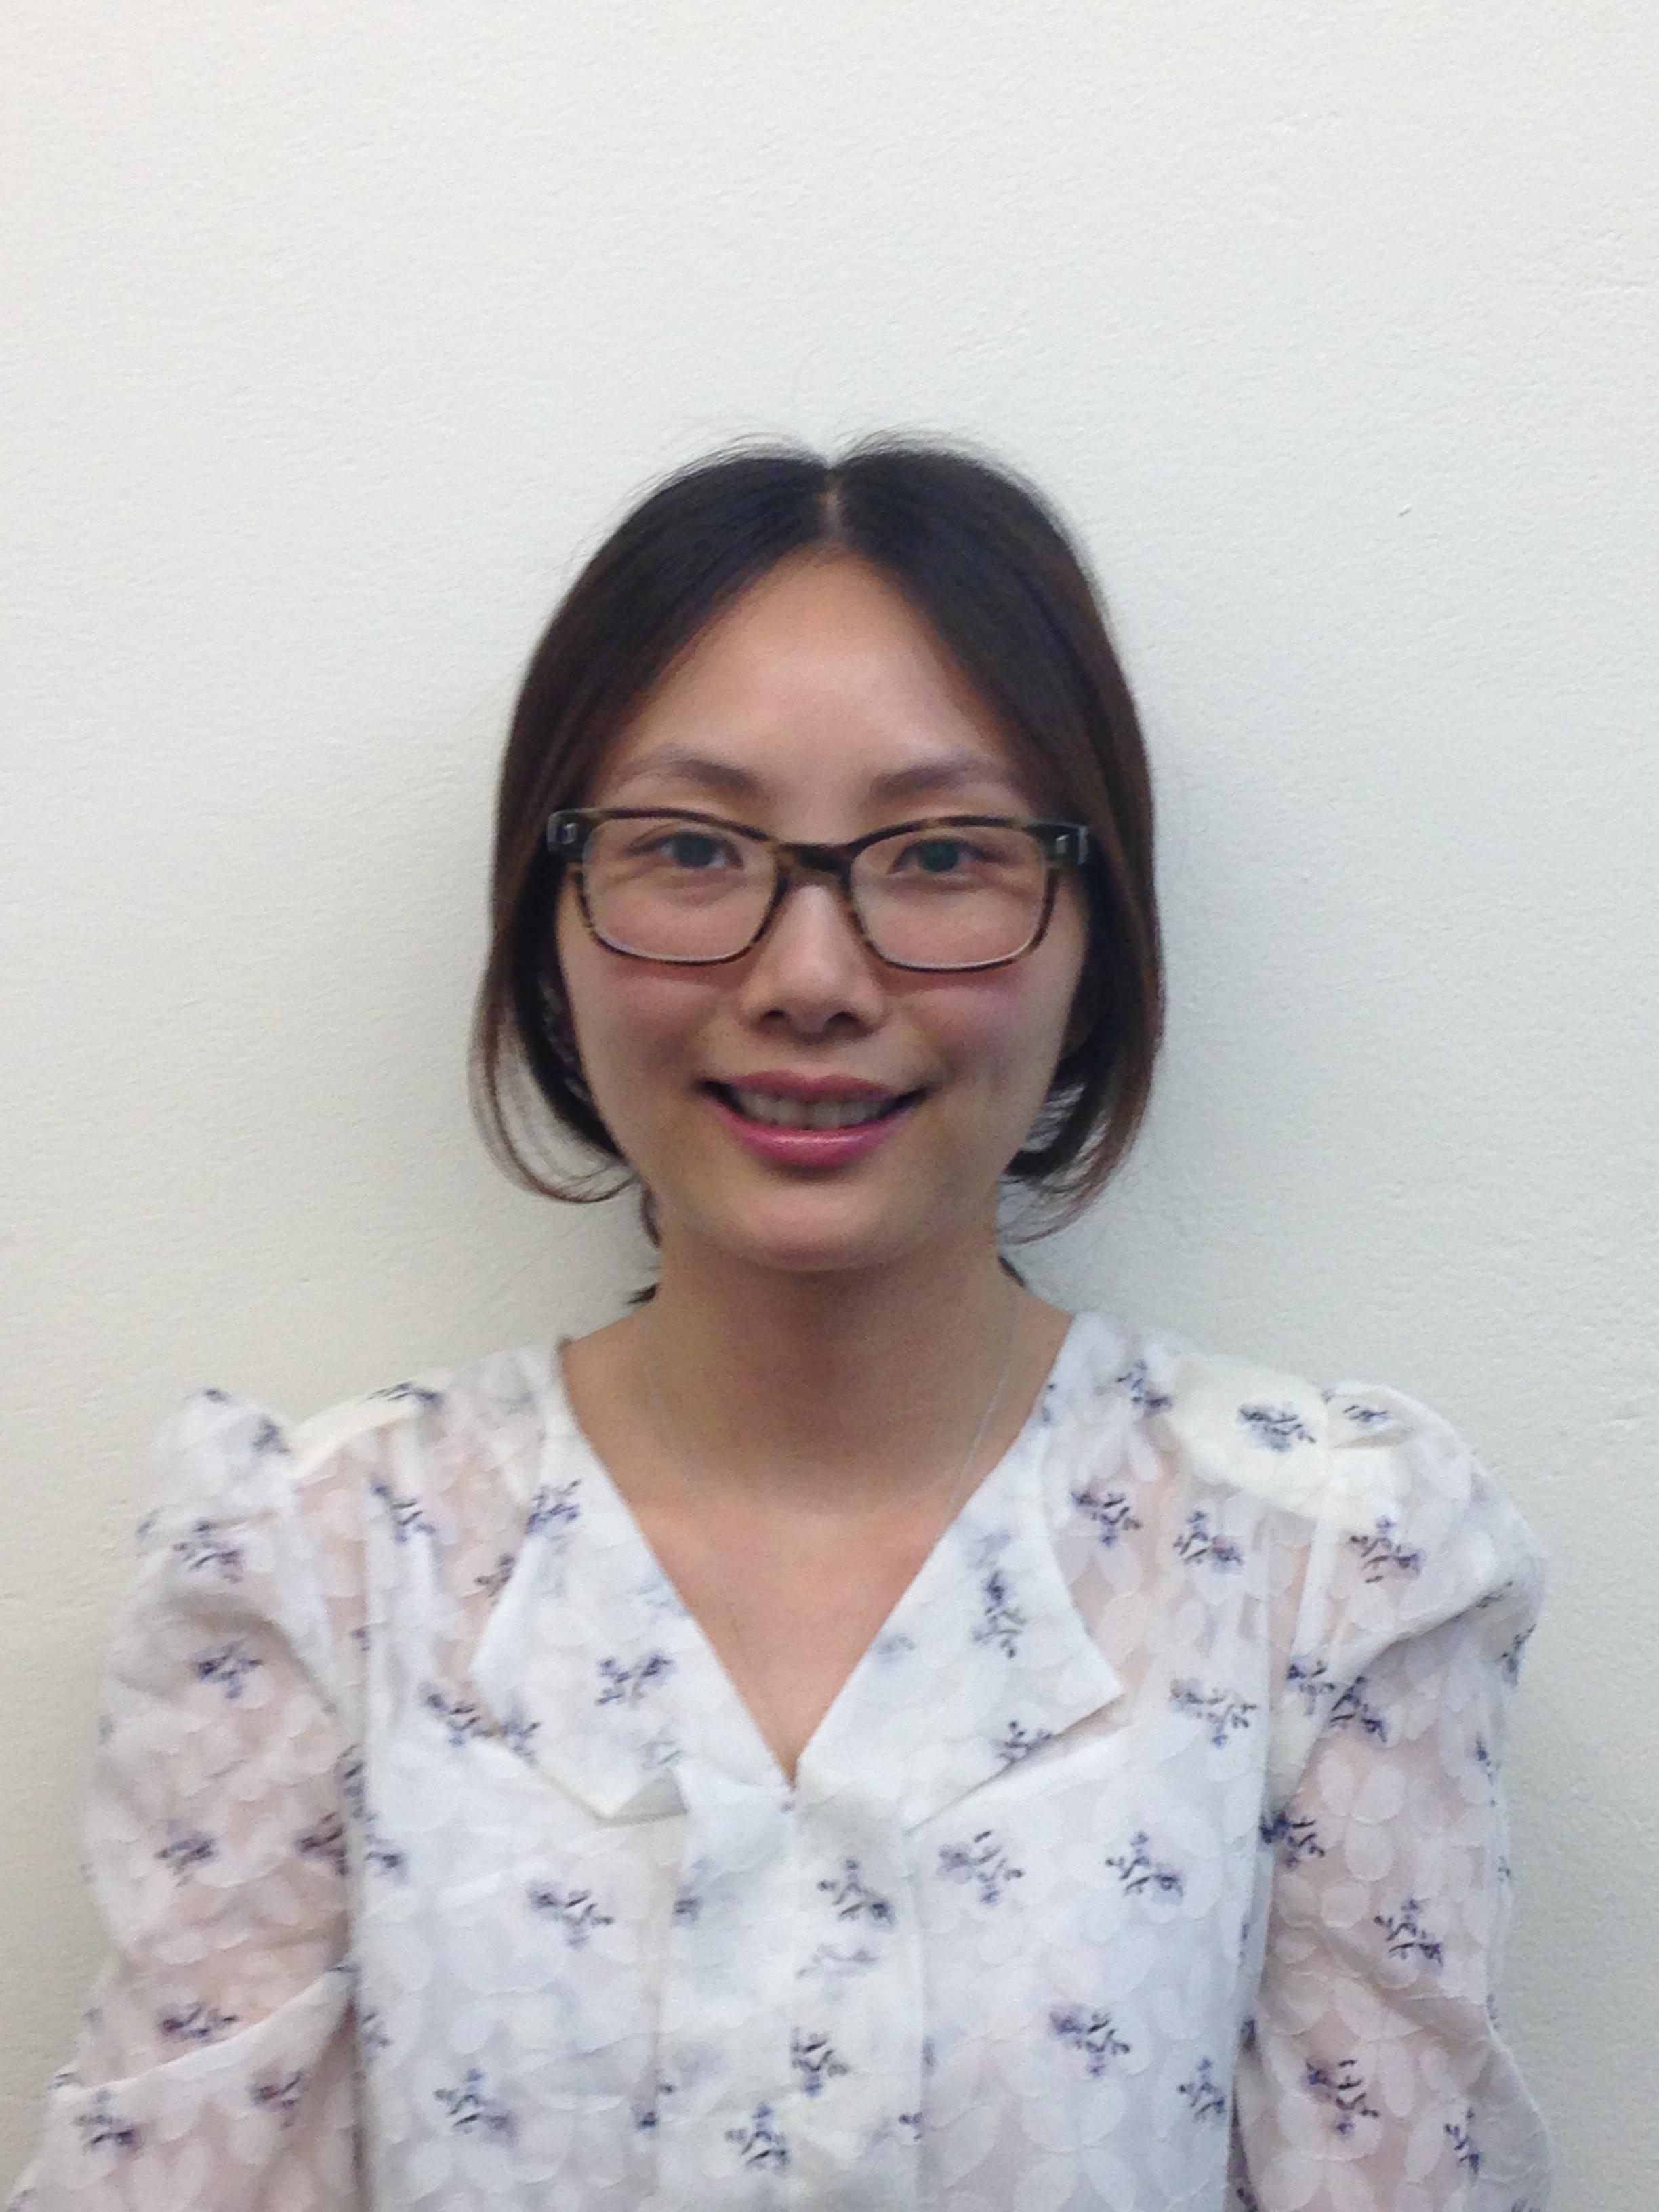 Katrina Liu